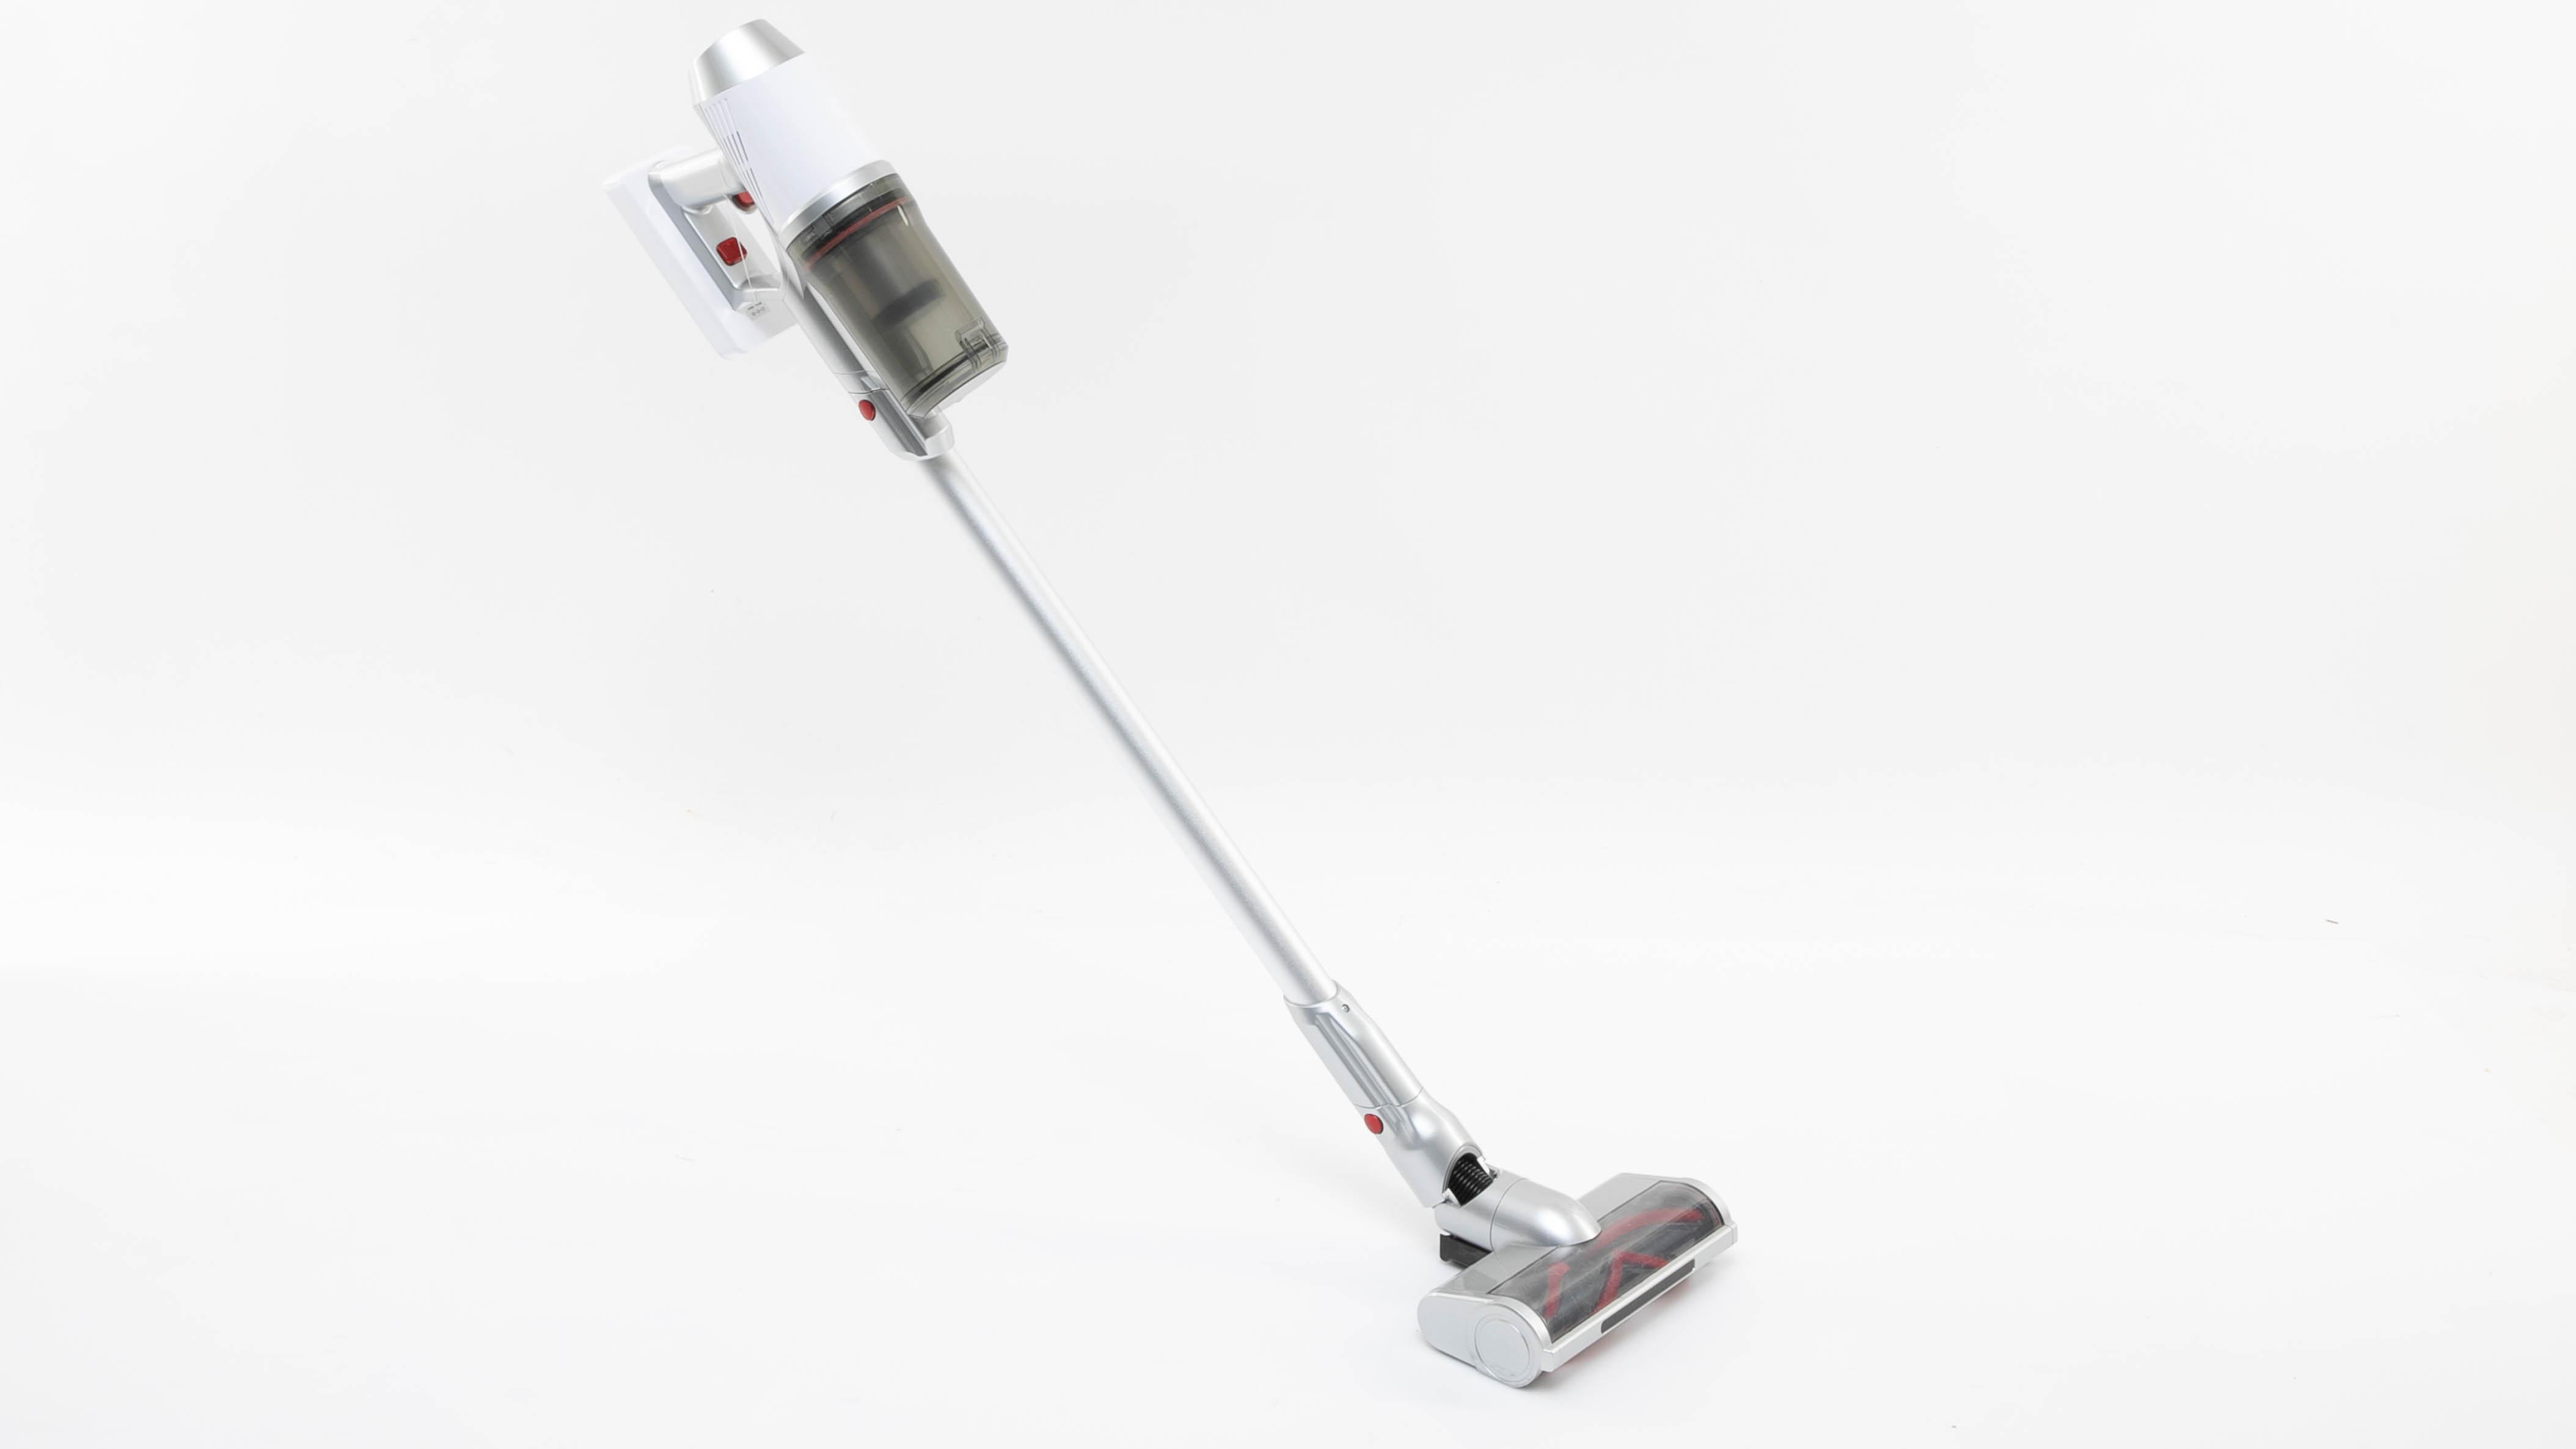 Kmart Anko Cordless Stick Cleaner 42923558 carousel image